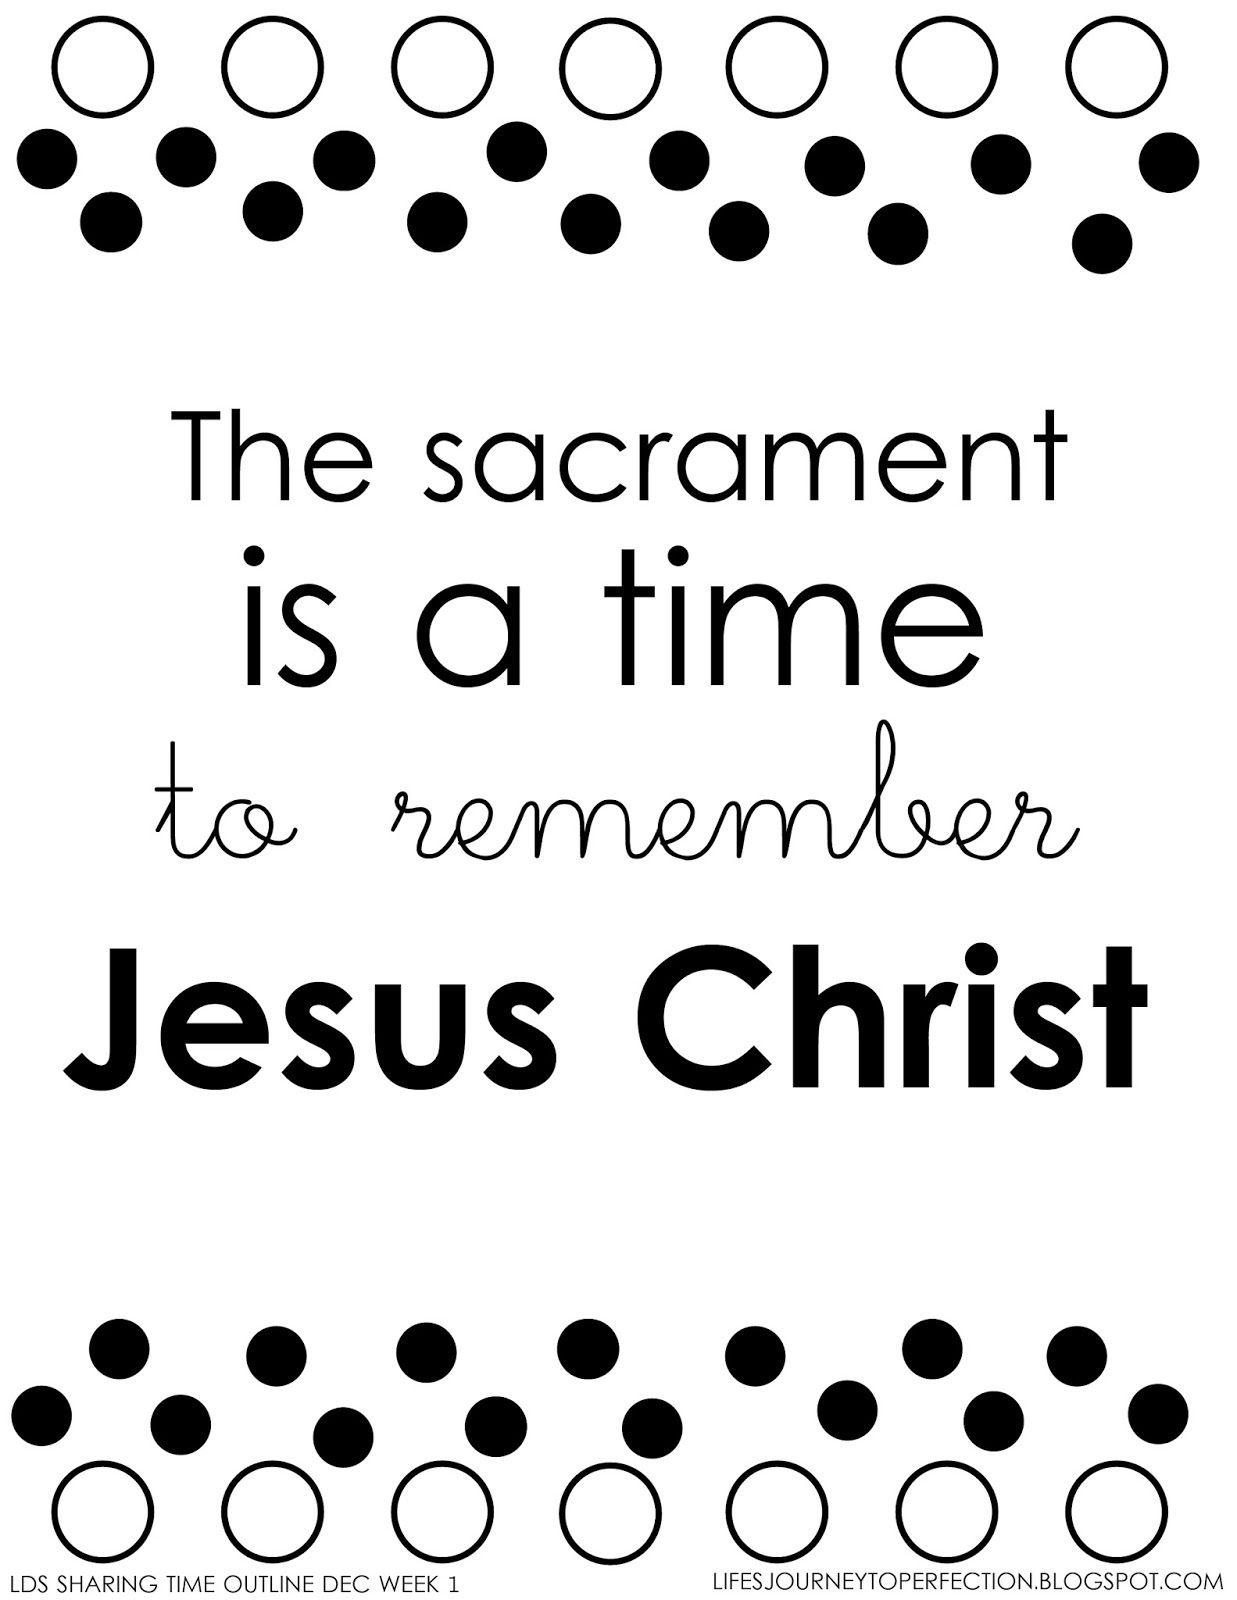 LDS Sharing Time December 2014 Week 1: The sacrament is a